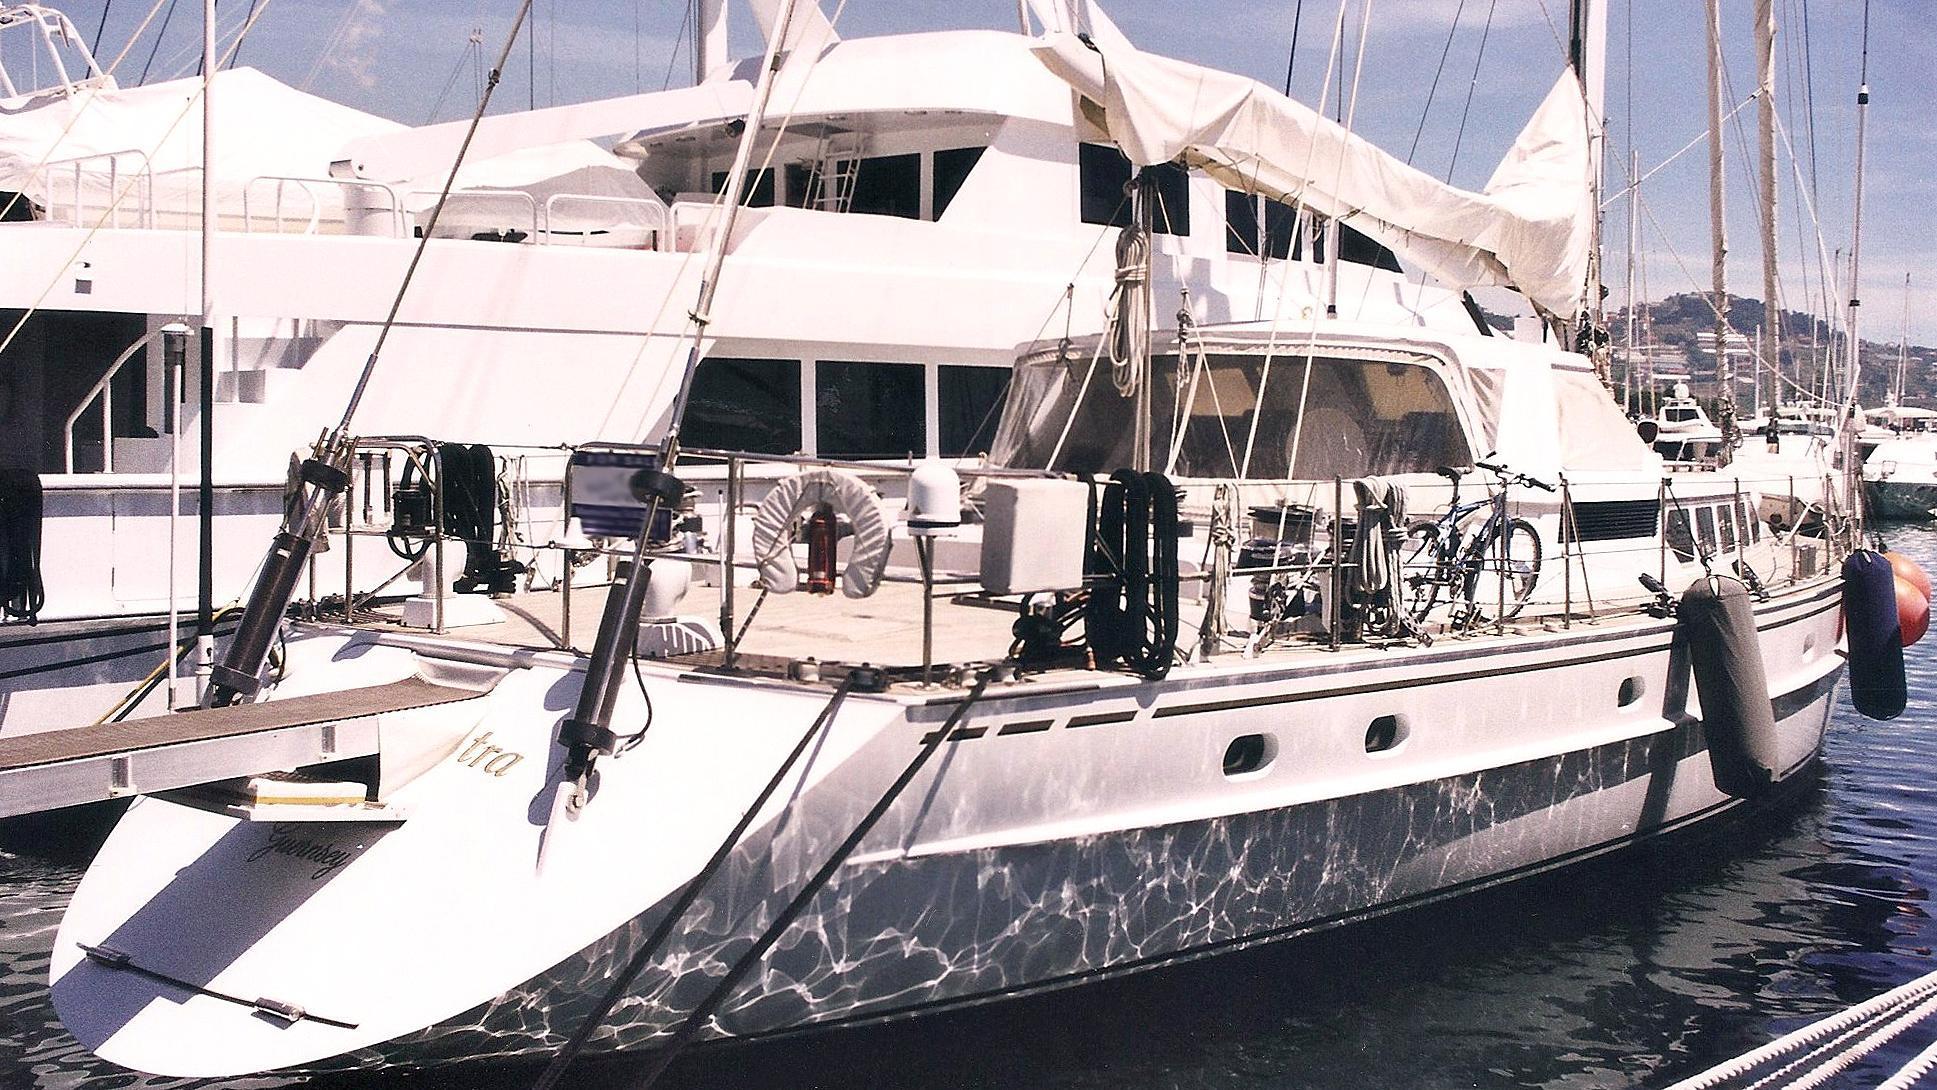 spes-nostra-sailing-yacht-jongert-2800s-1988-28m-stern-profile